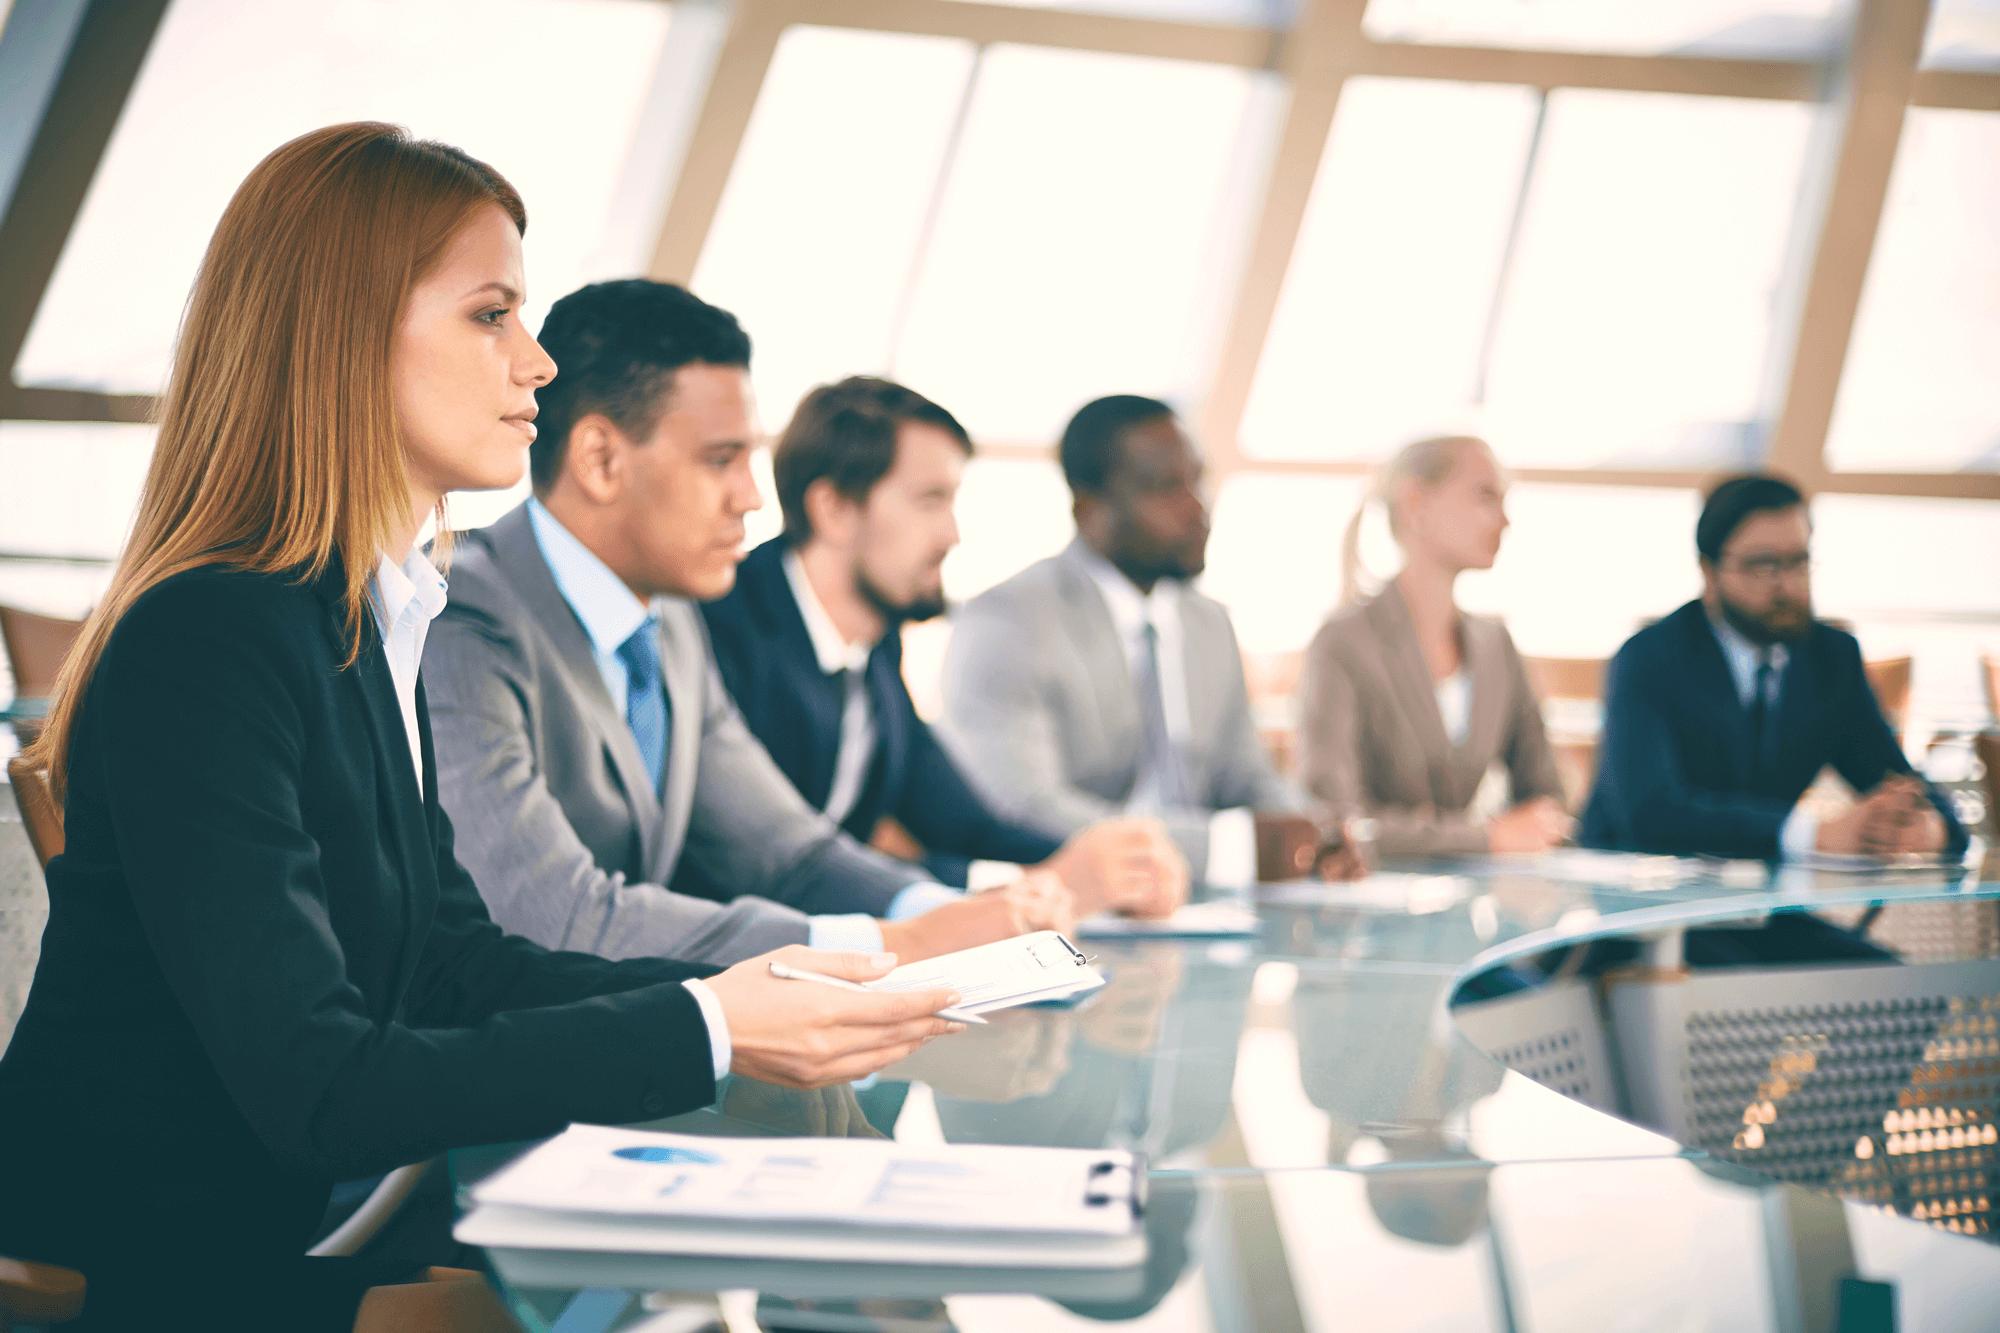 Data Analytics opleiding | 10+ Business Analytics opleidingen